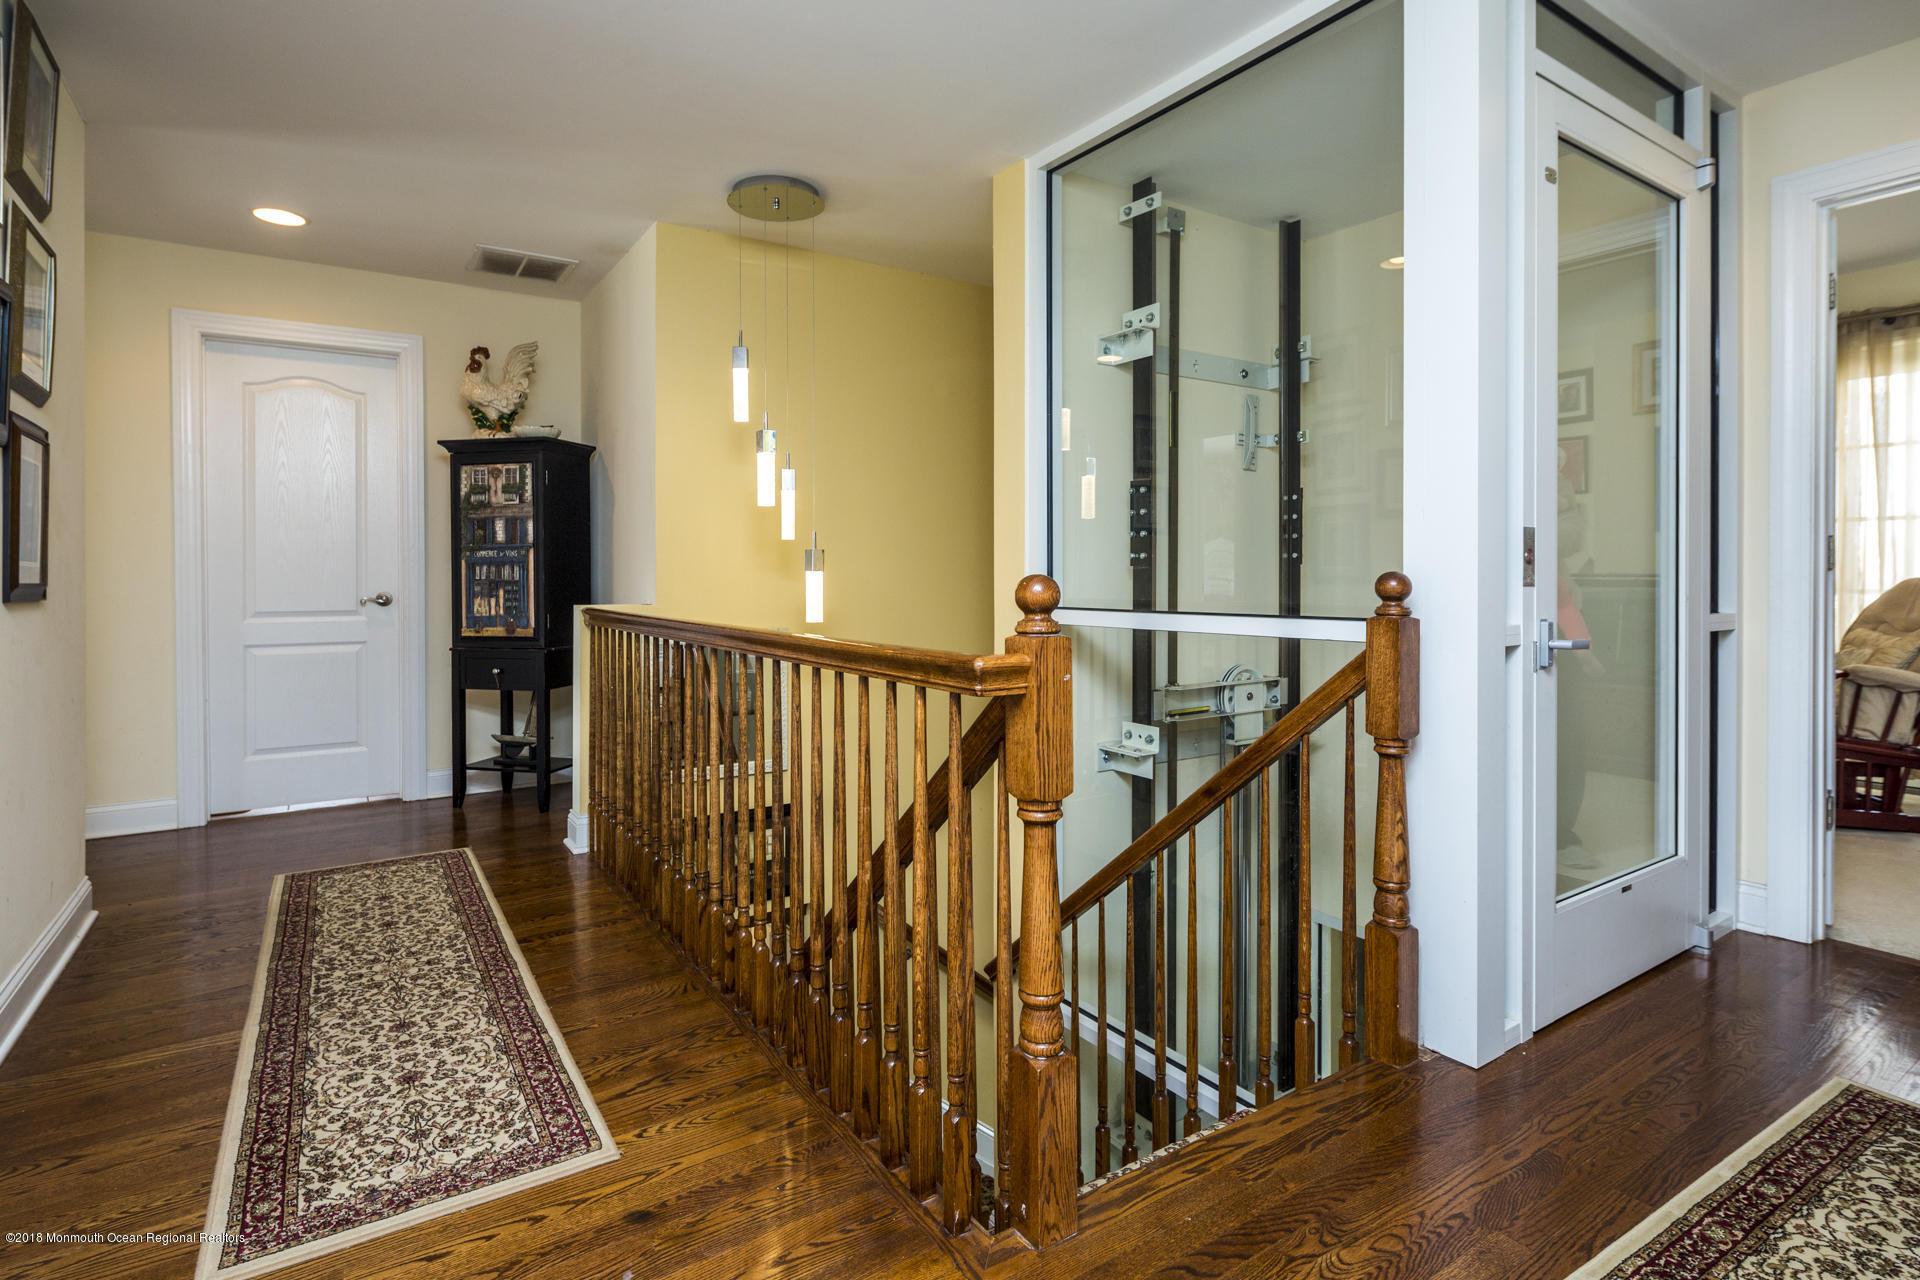 35_Upper Hallway